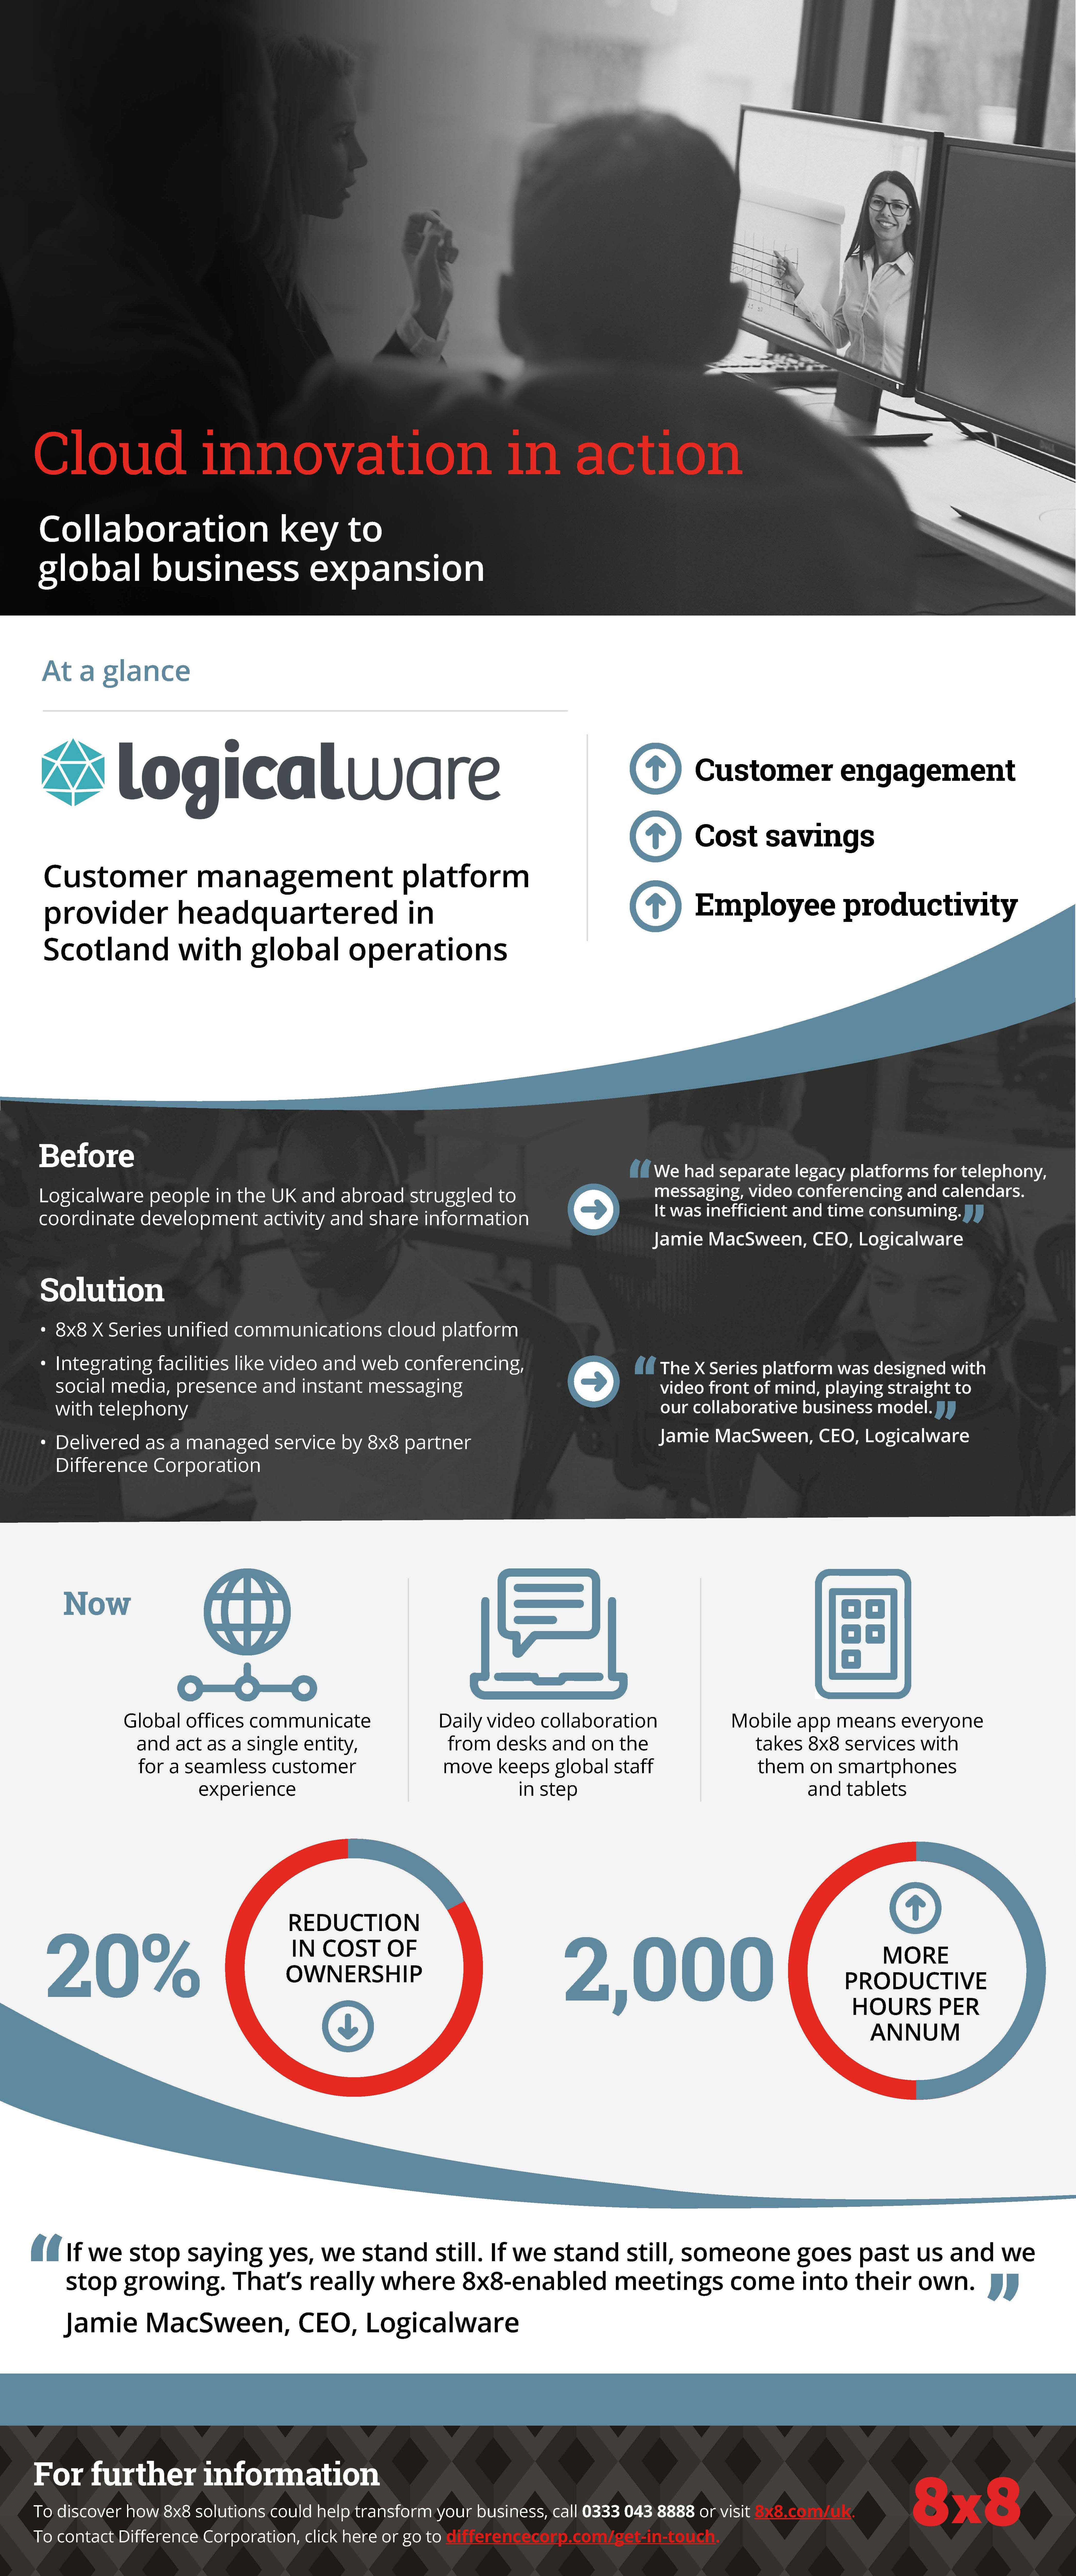 8x8_UK_LogicalWare_Infographic.jpg